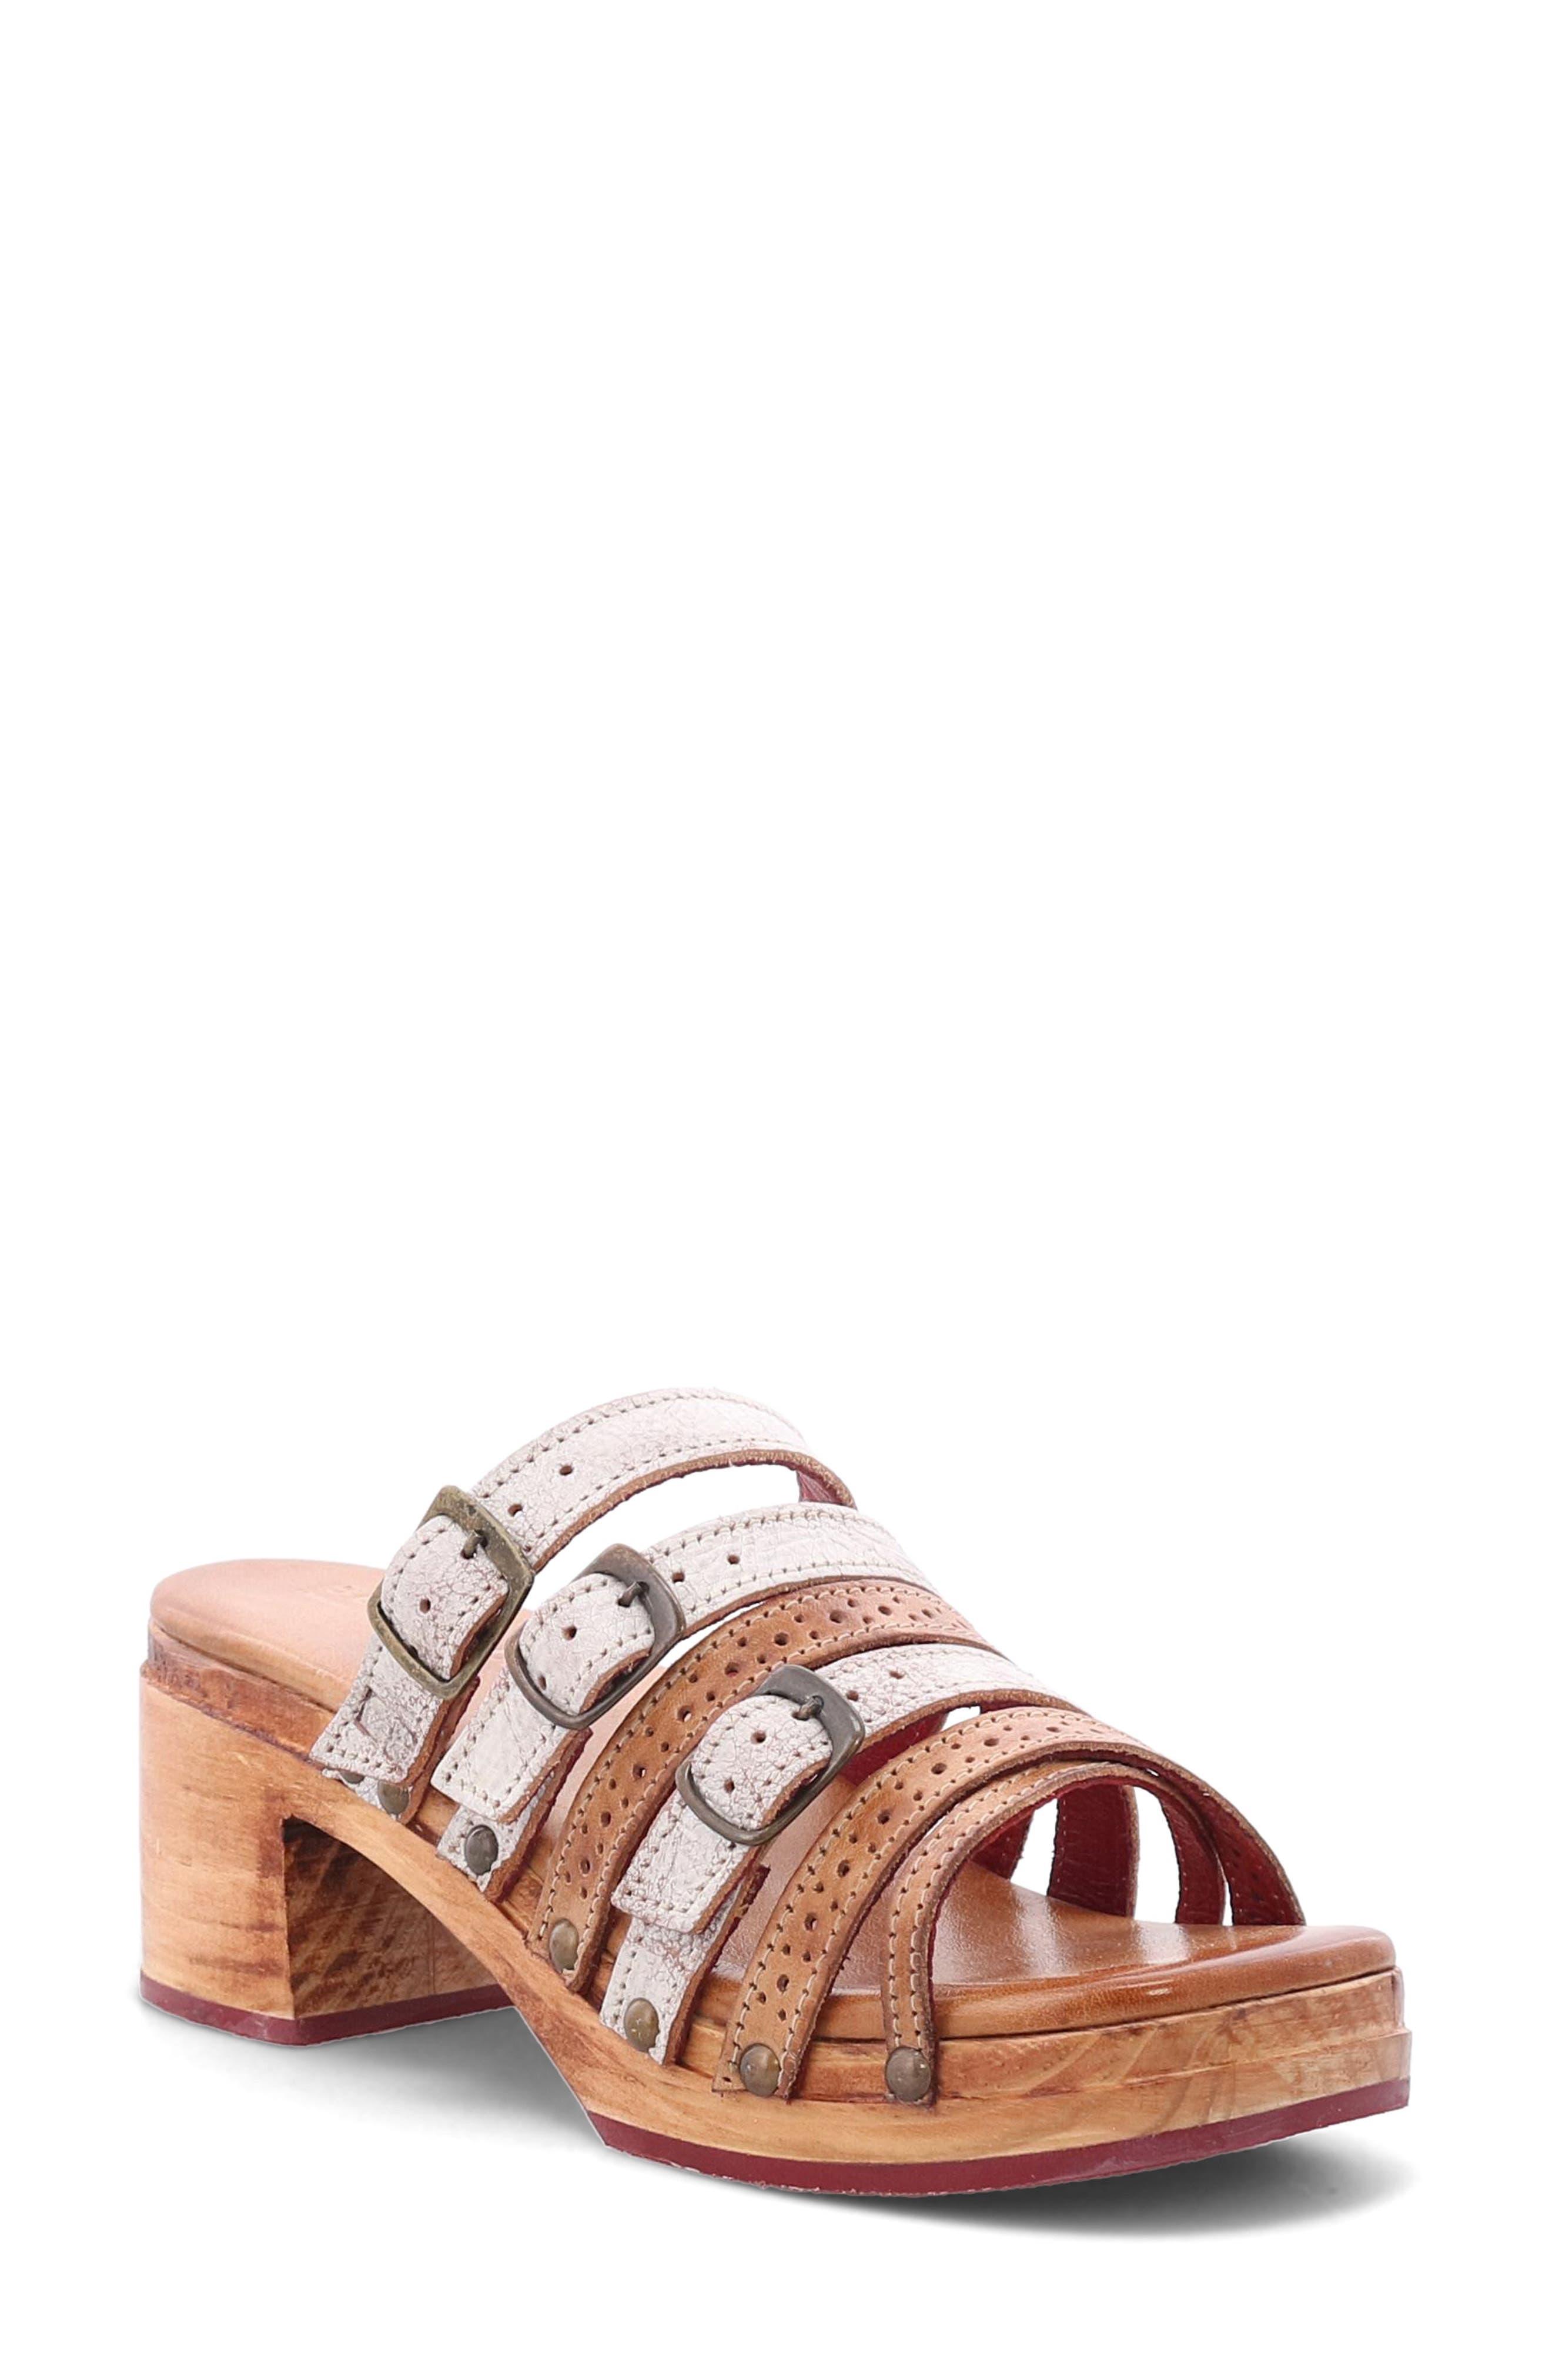 Adriana Strappy Slide Sandal